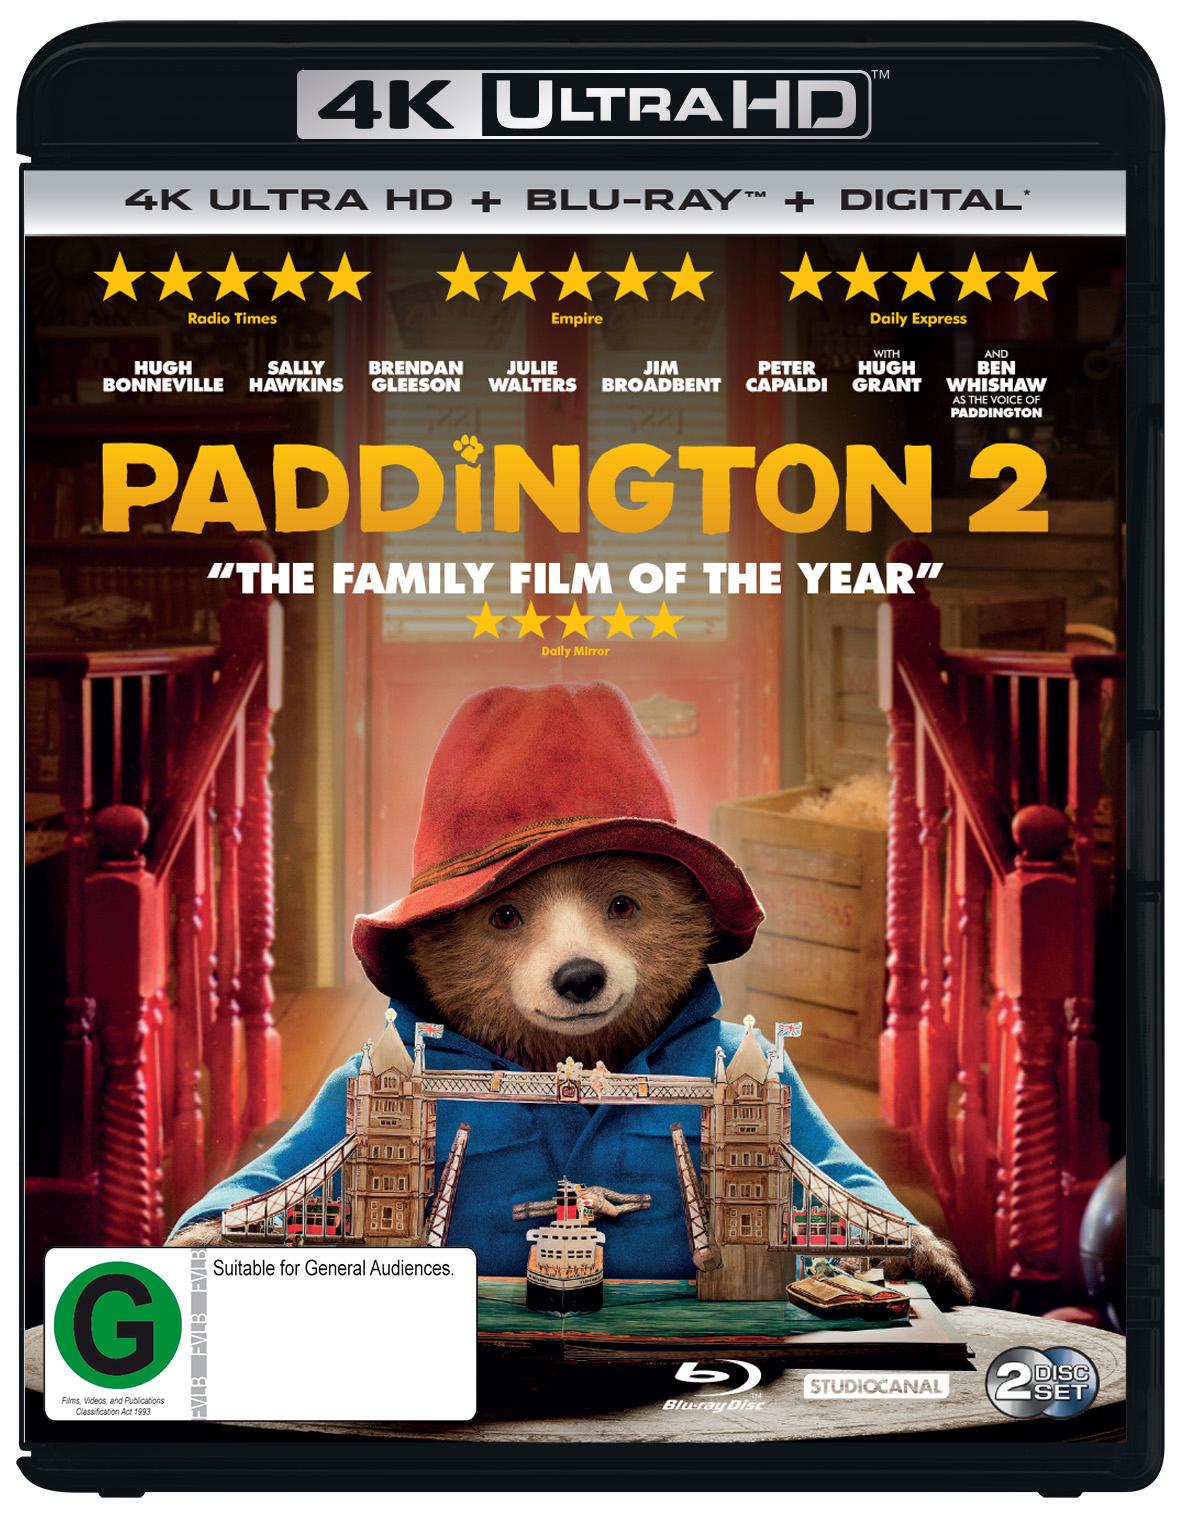 Paddington 2 on UHD Blu-ray image